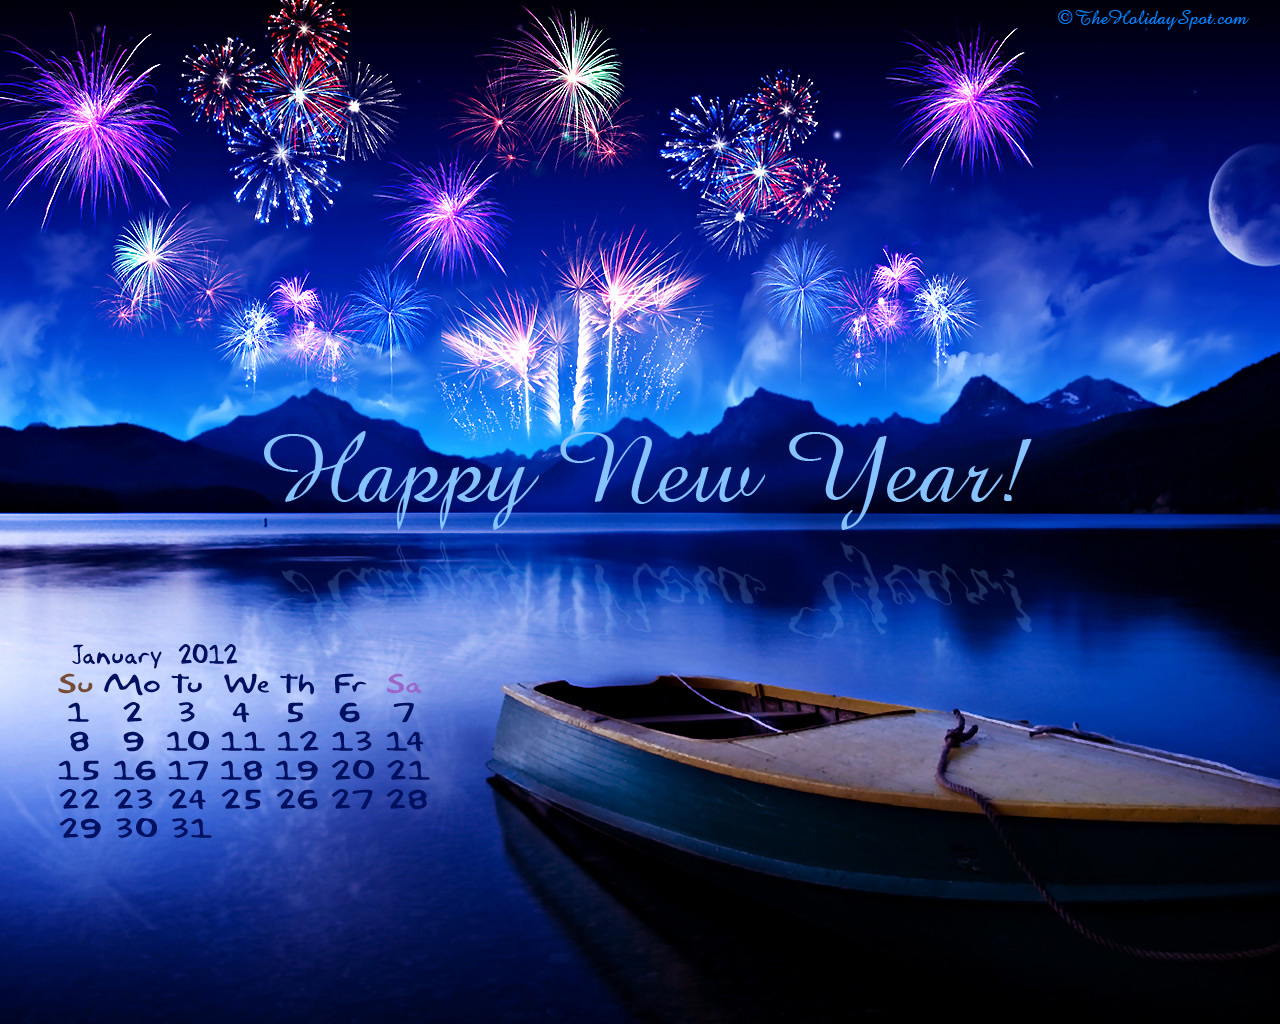 January 2nd 2012 Desktop Wallpaper Calendars January 2012 1280x1024